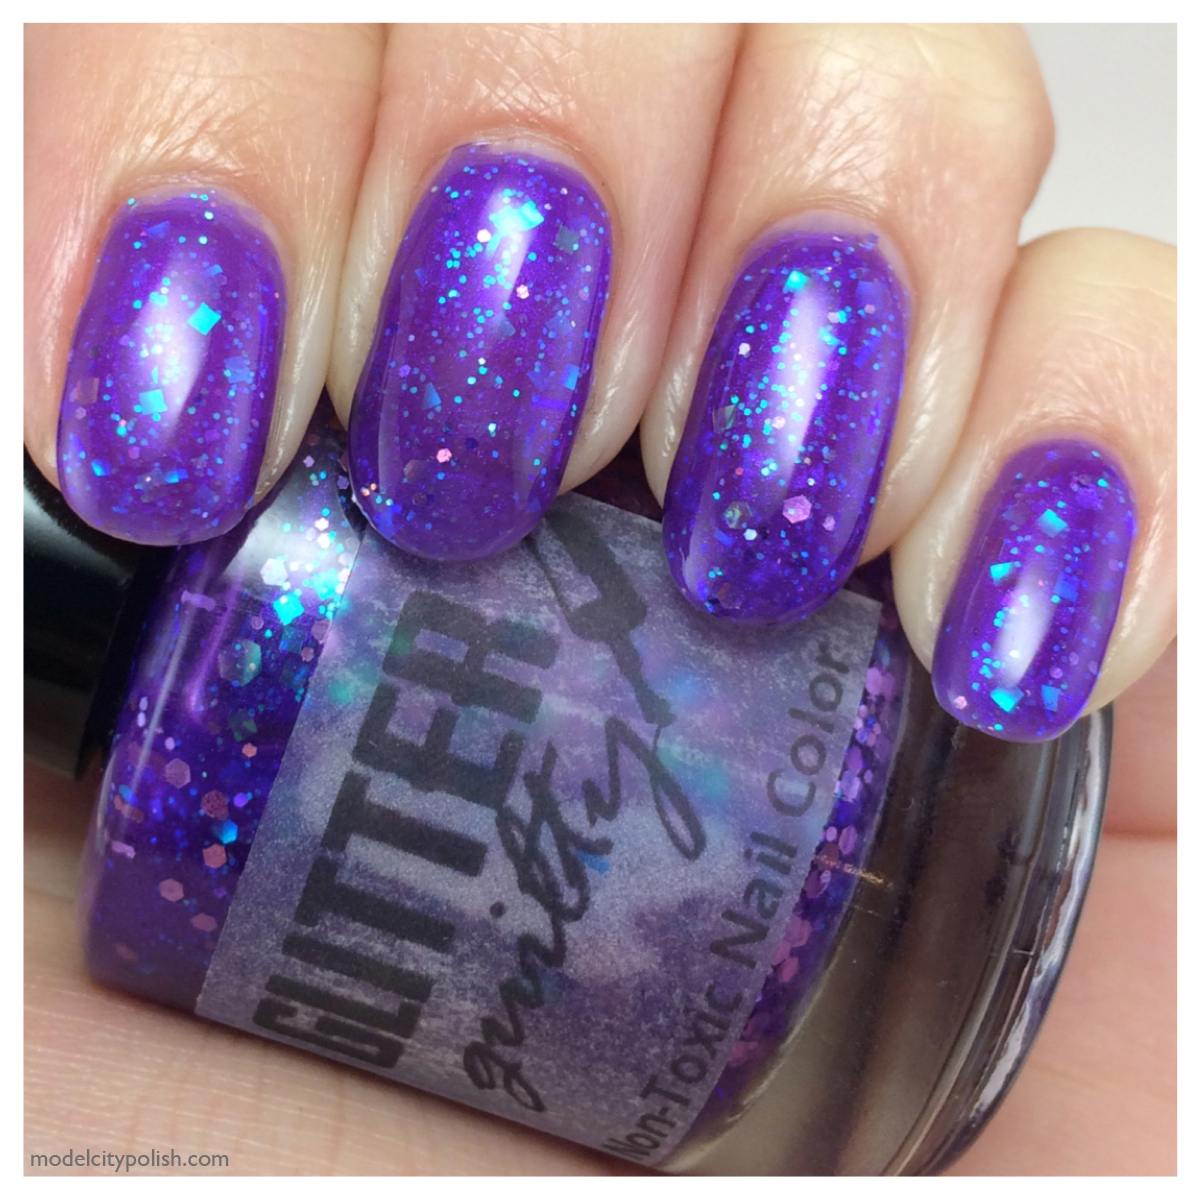 Violet Vixen 1